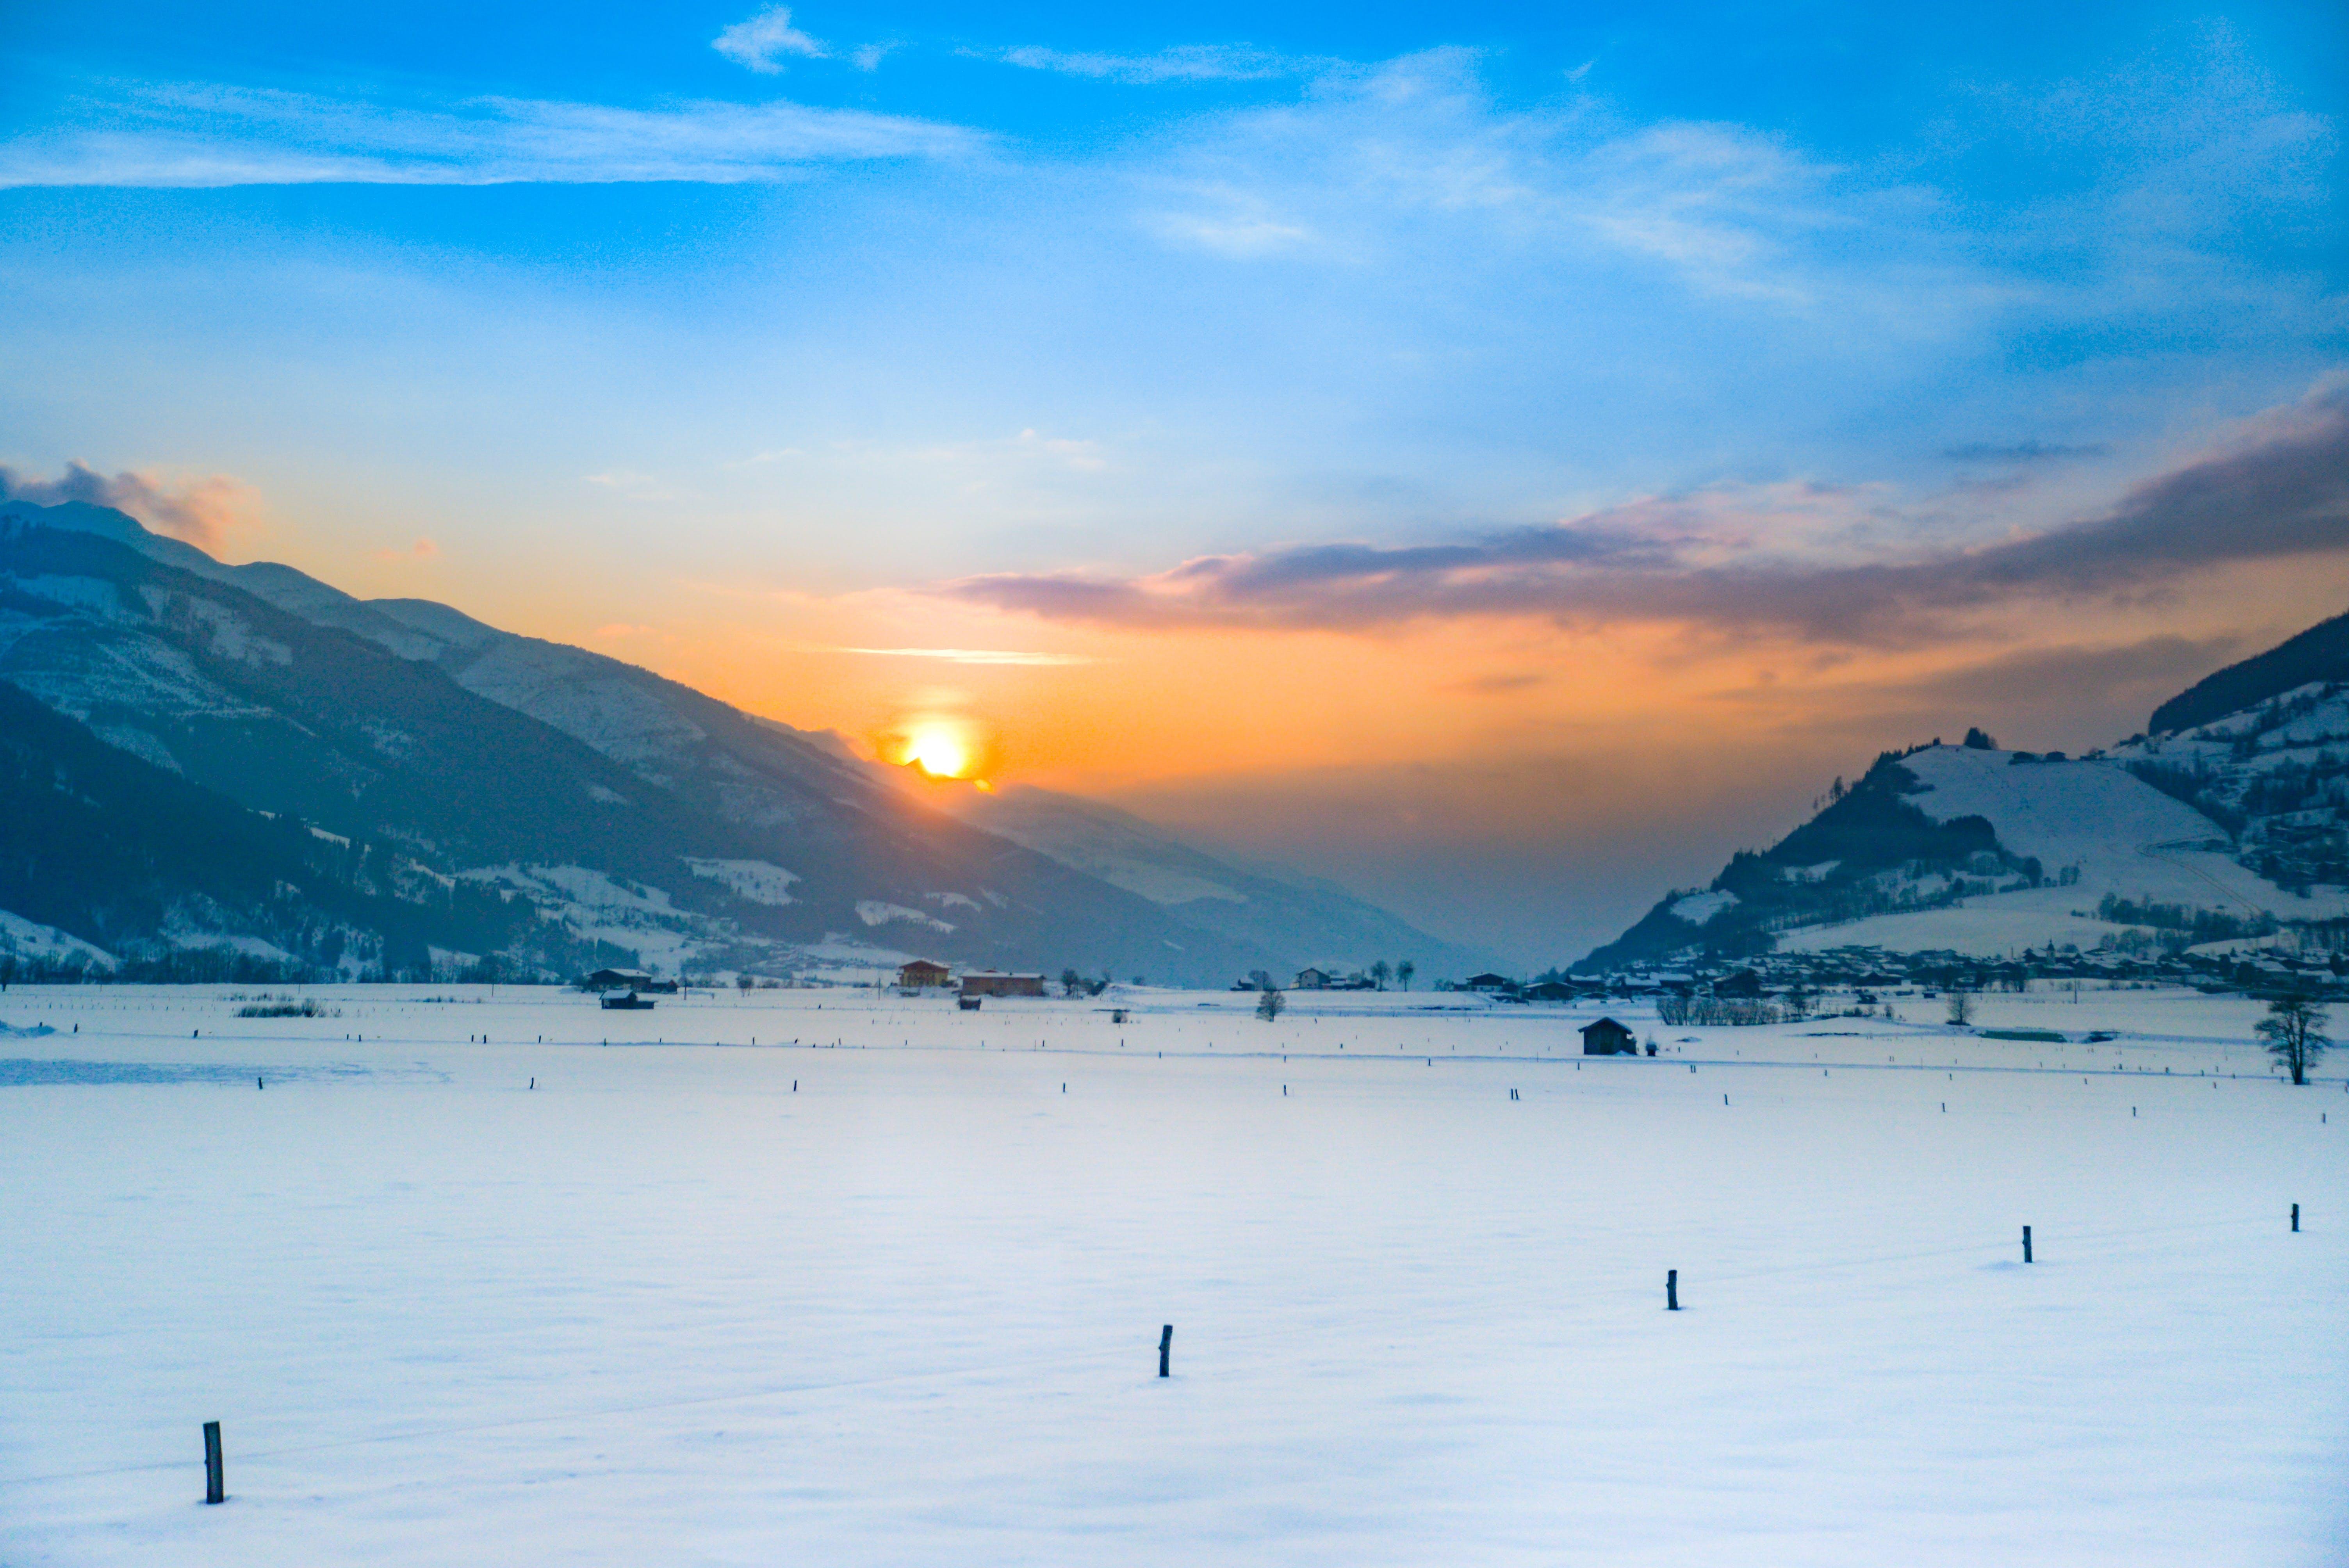 Time Lapse Photography of Sunrise